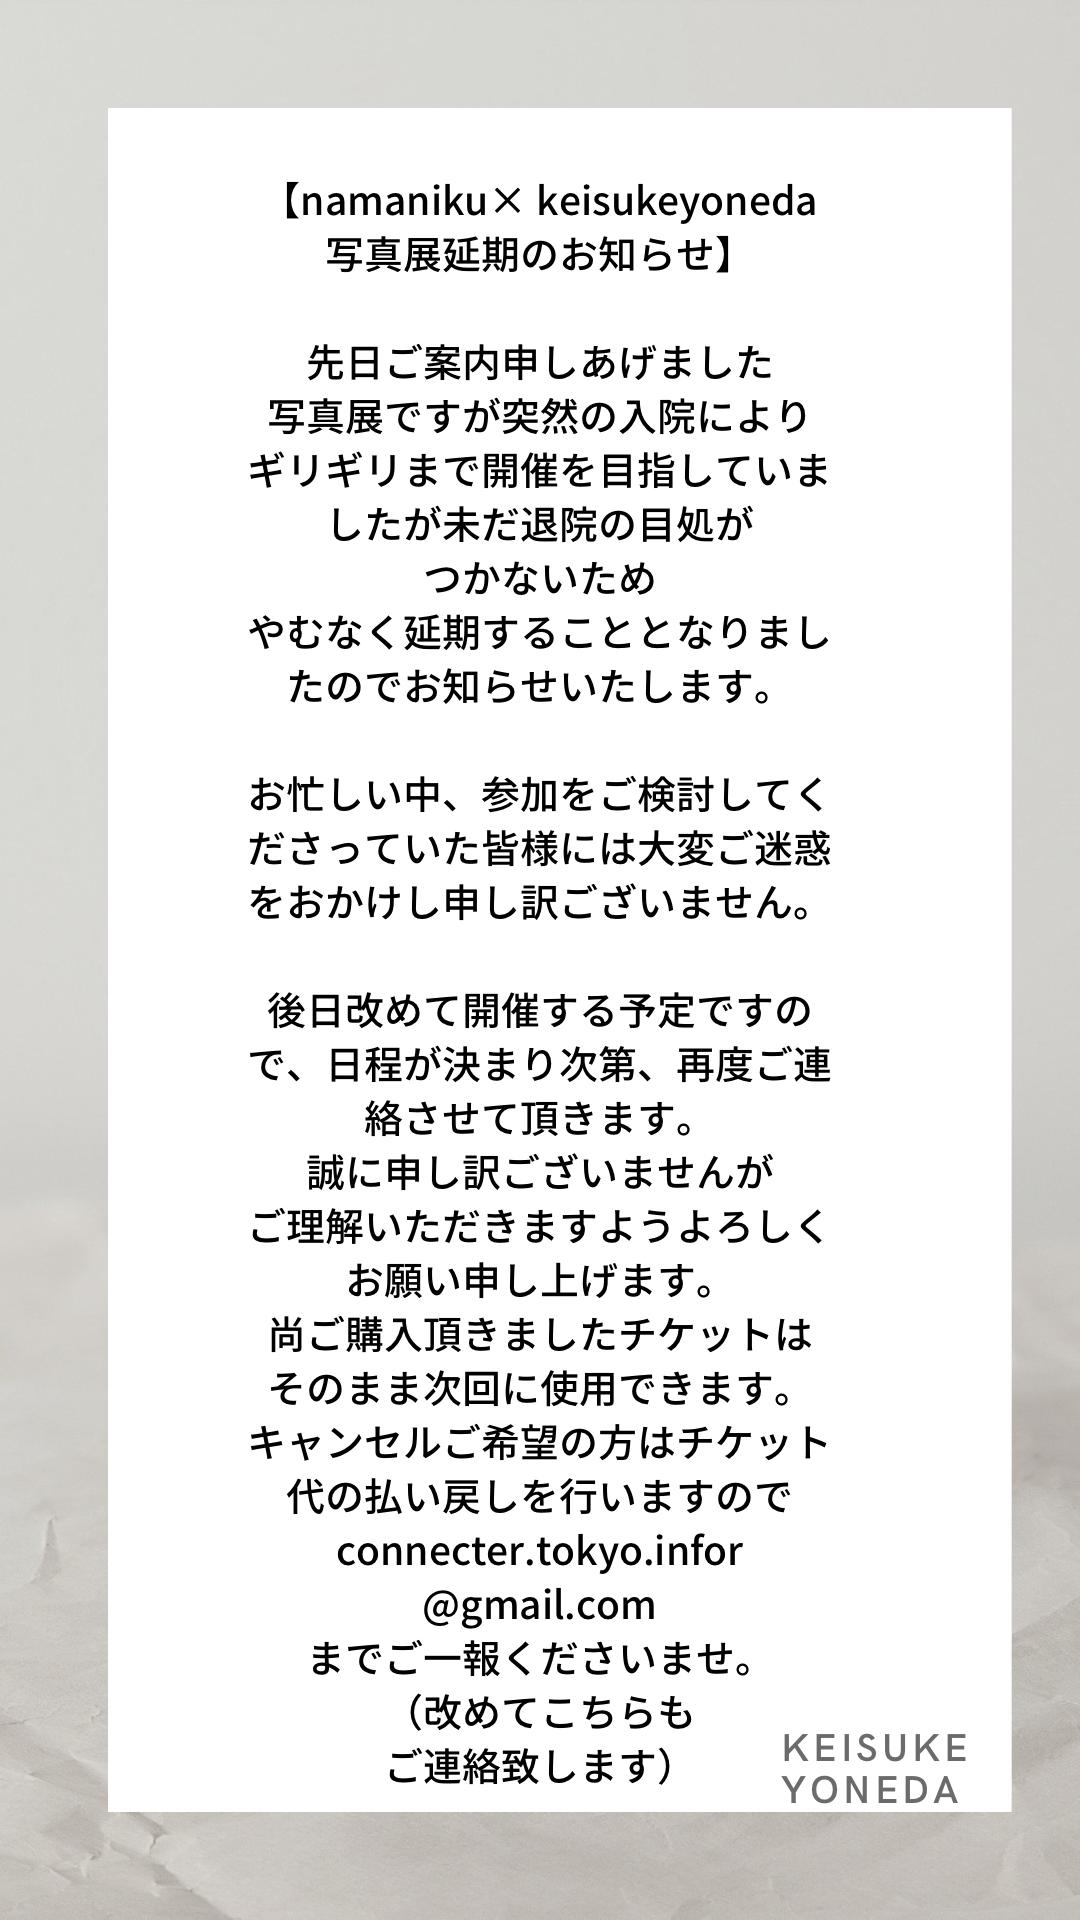 Namaniku ×Keisukeyoneda写真展延期のお知らせ